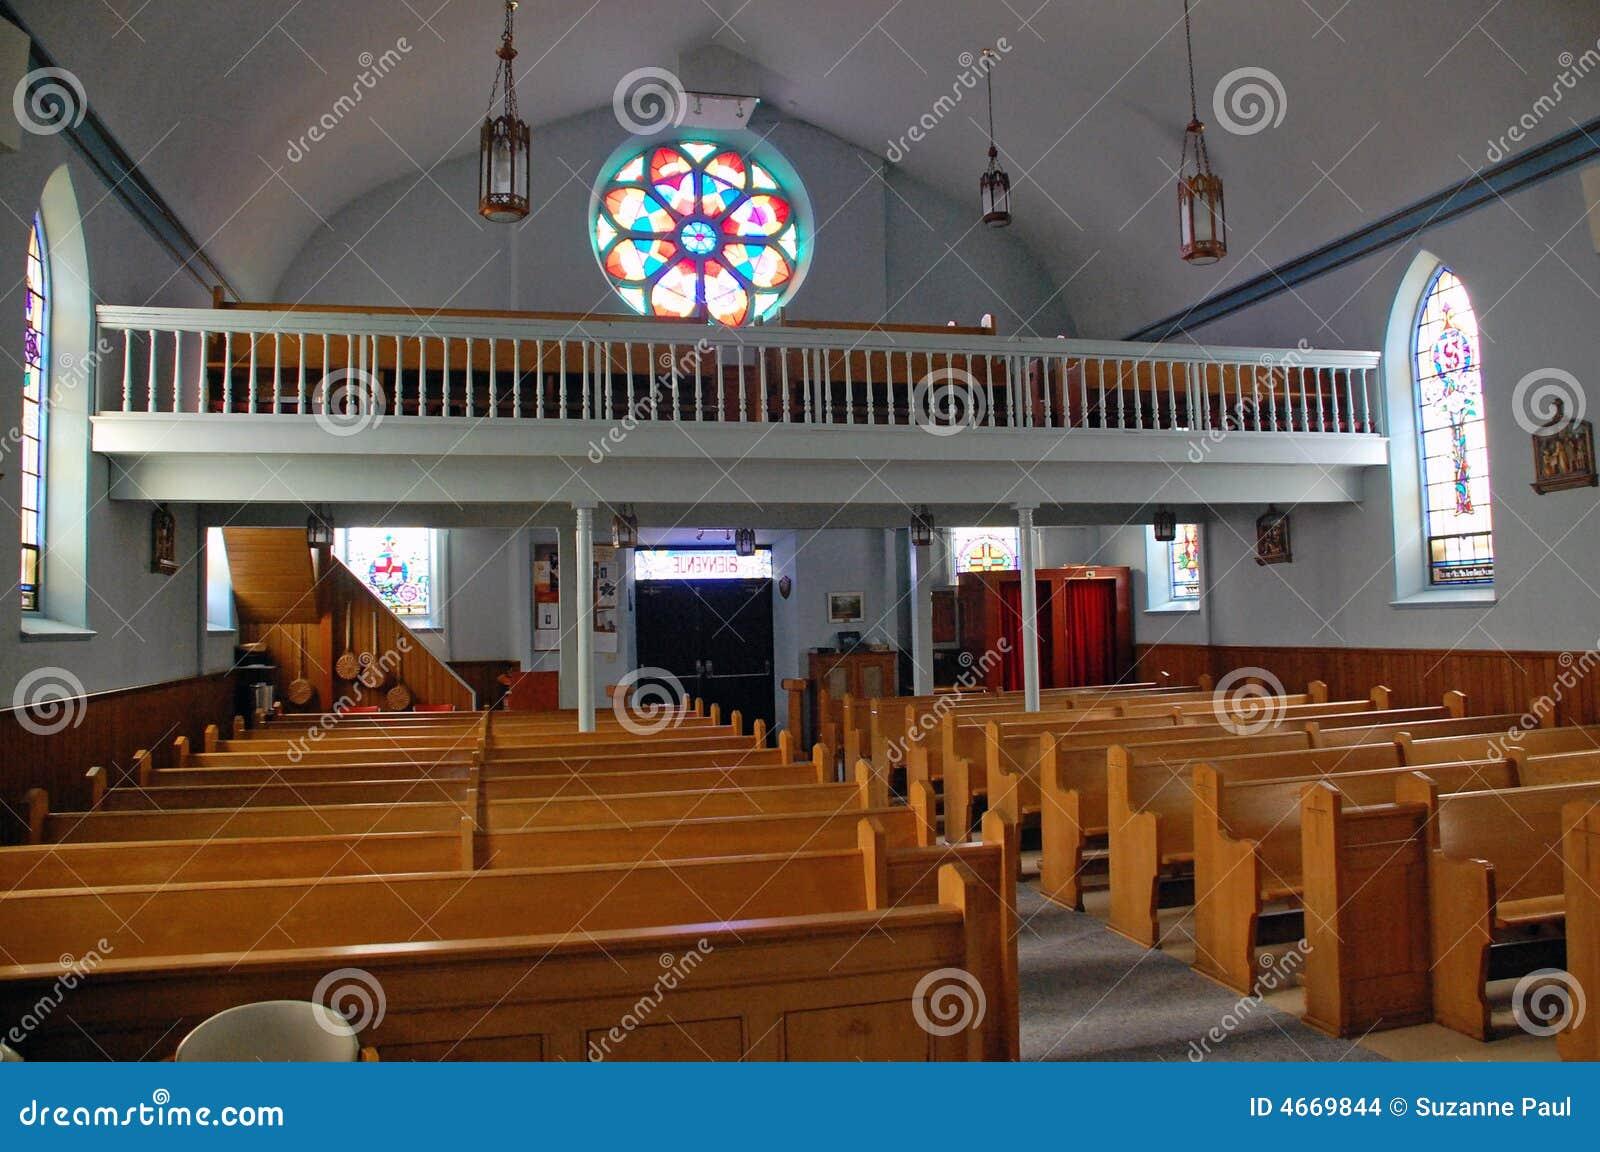 Catholic Church Sanctuary